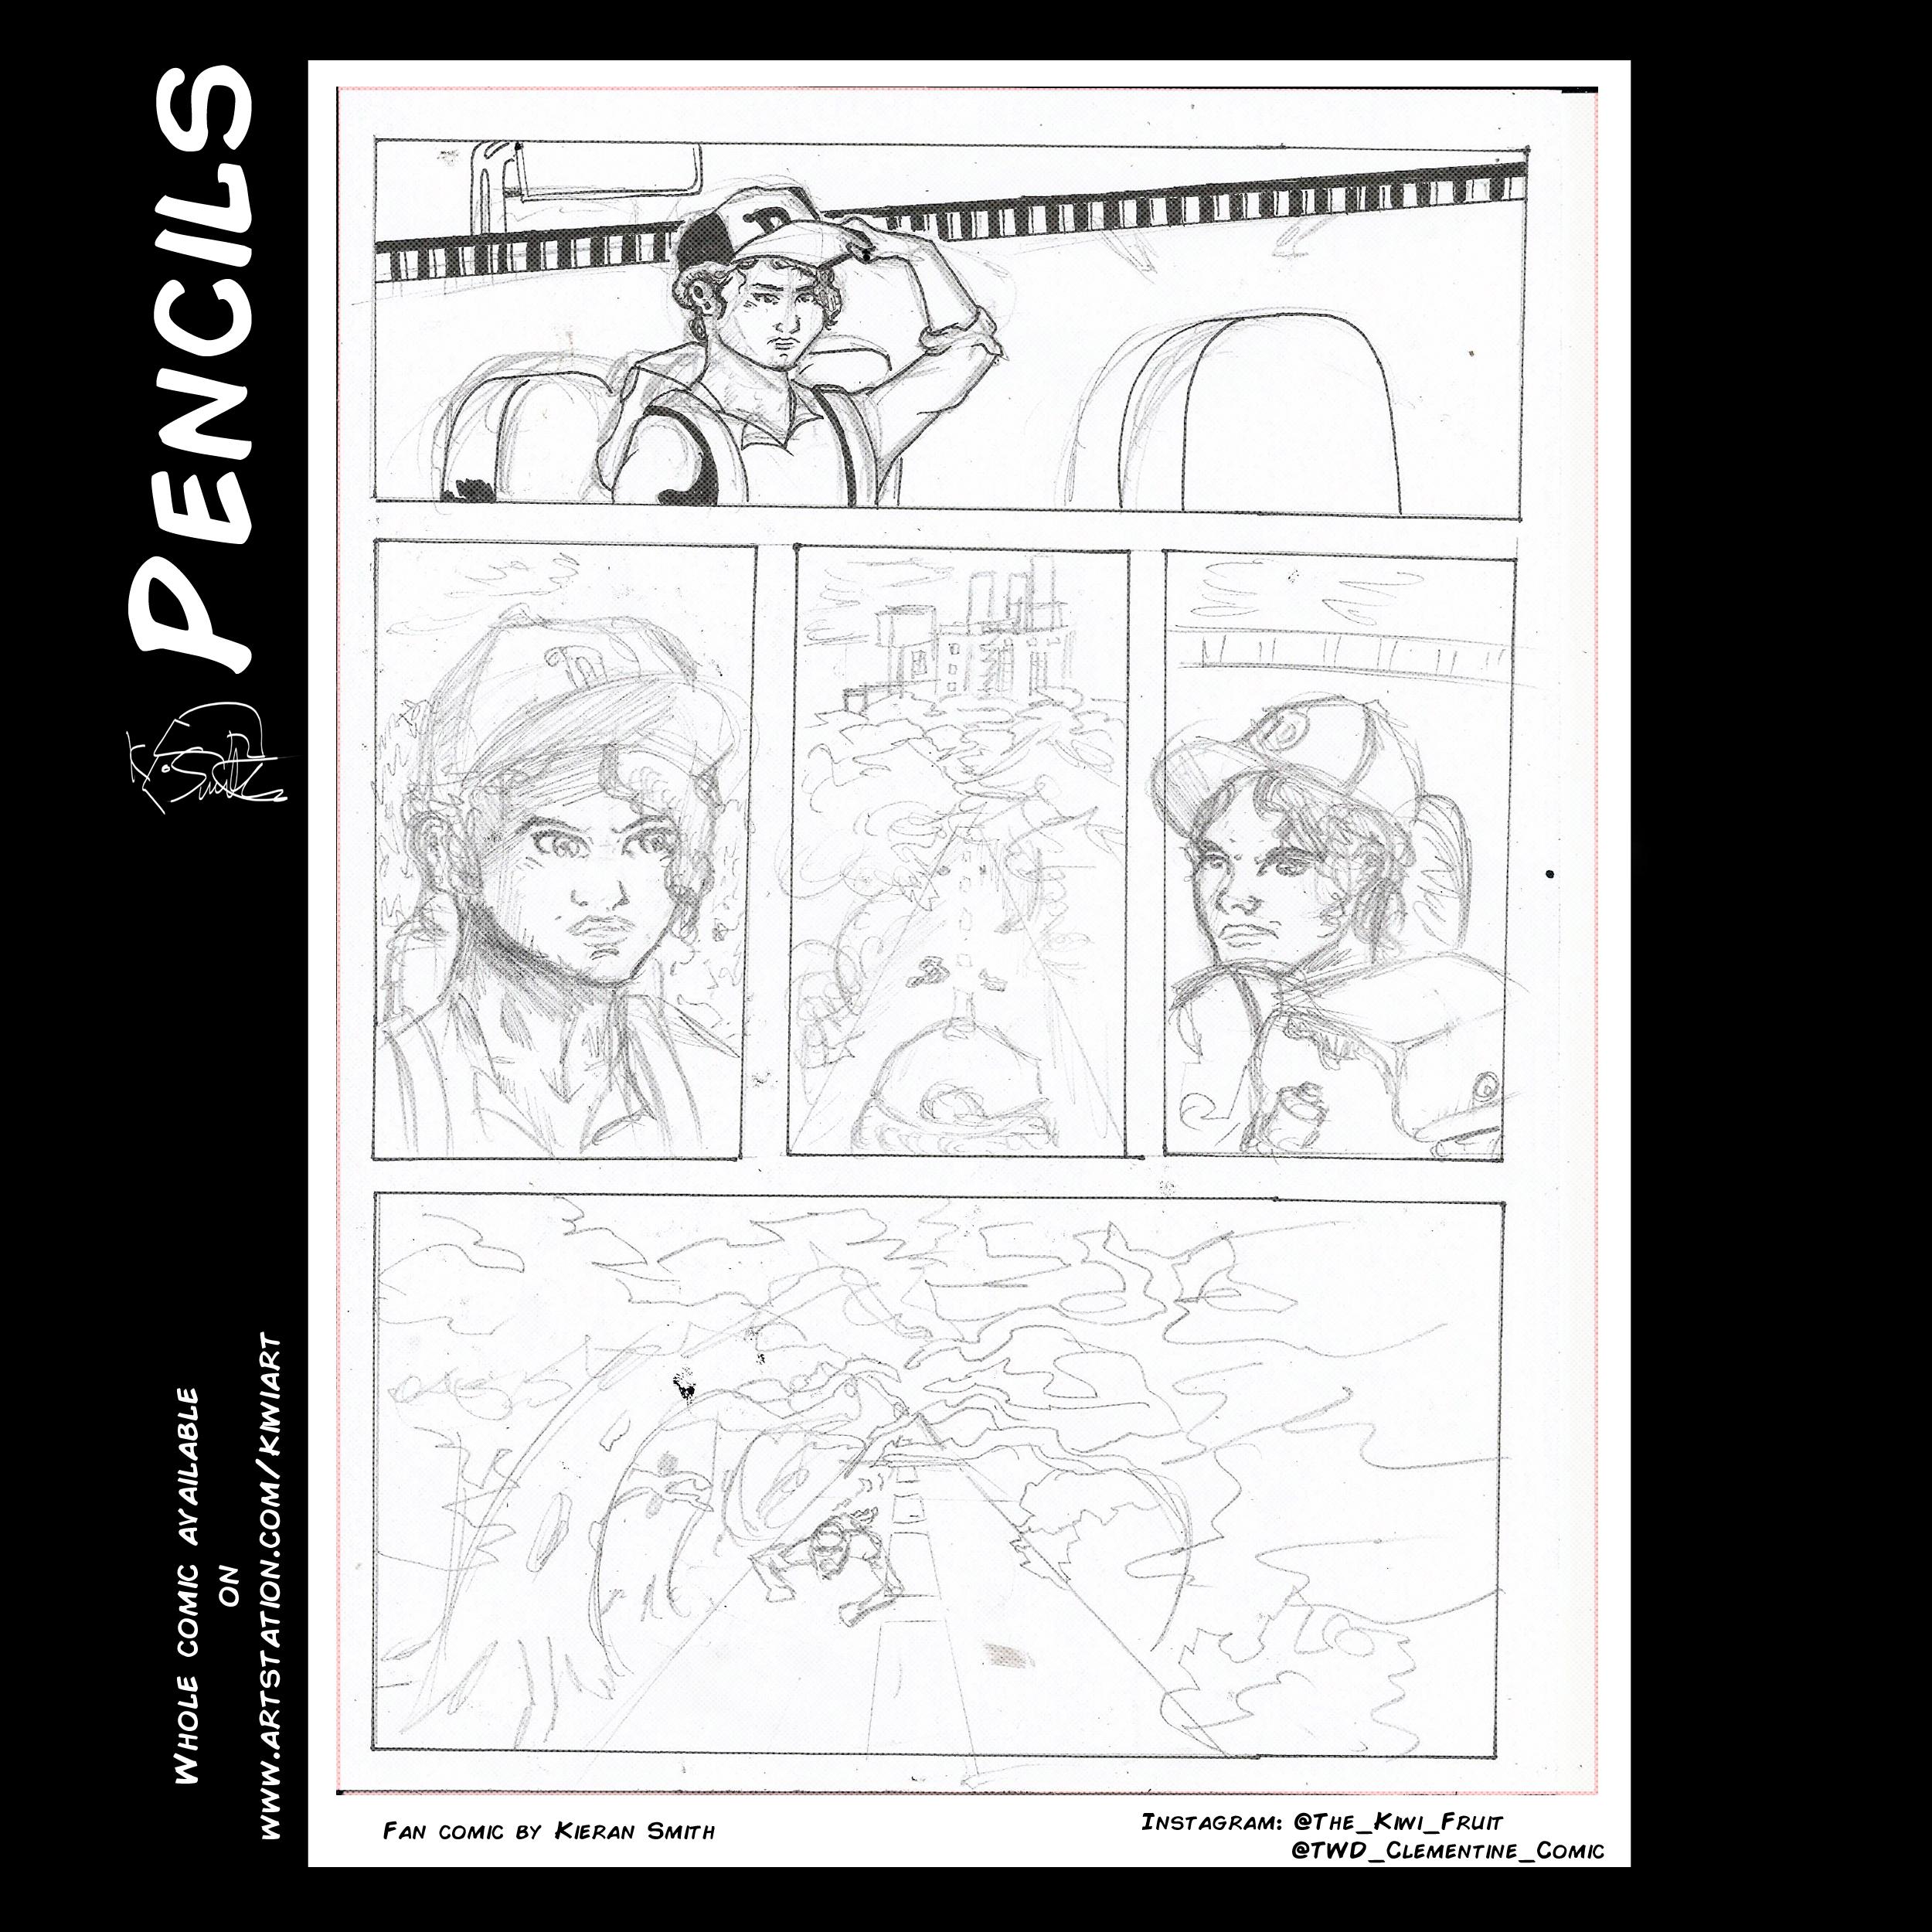 Walking Dead Clementine Page 23 Pencils